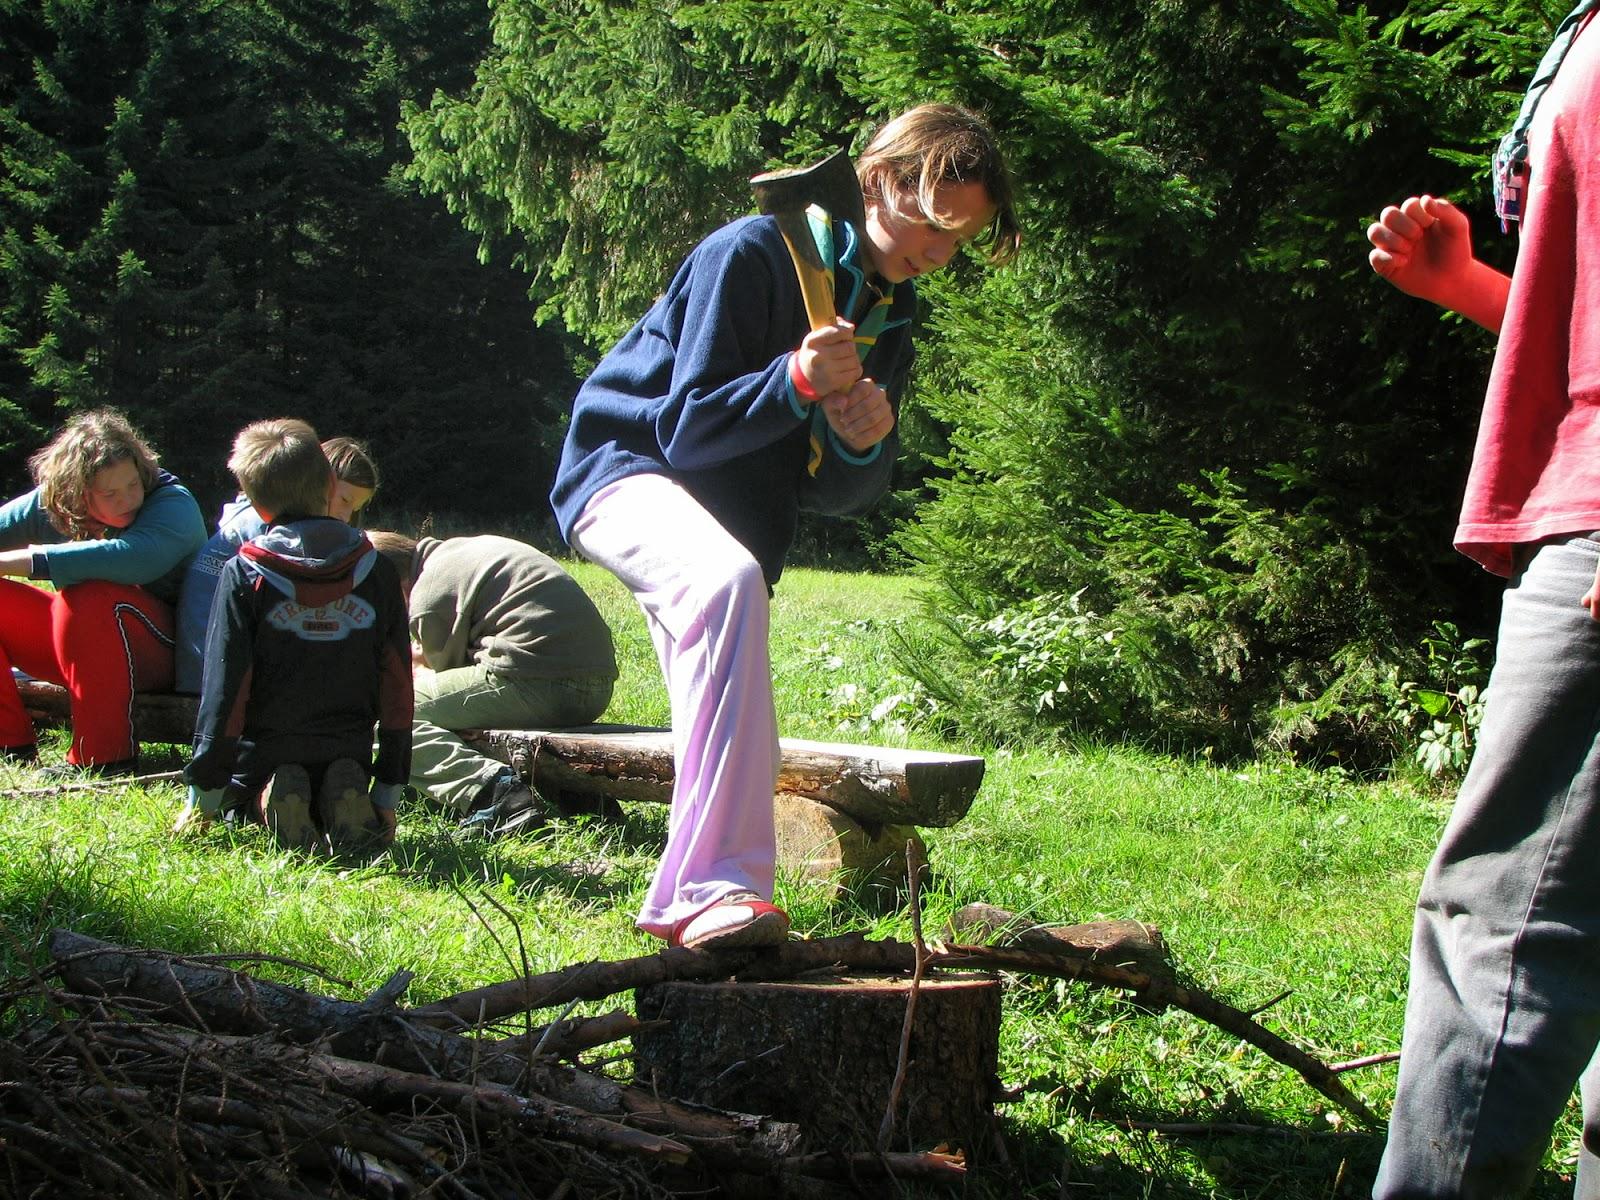 Vodov izlet, Ilirska Bistrica 2005 - Picture%2B135.jpg